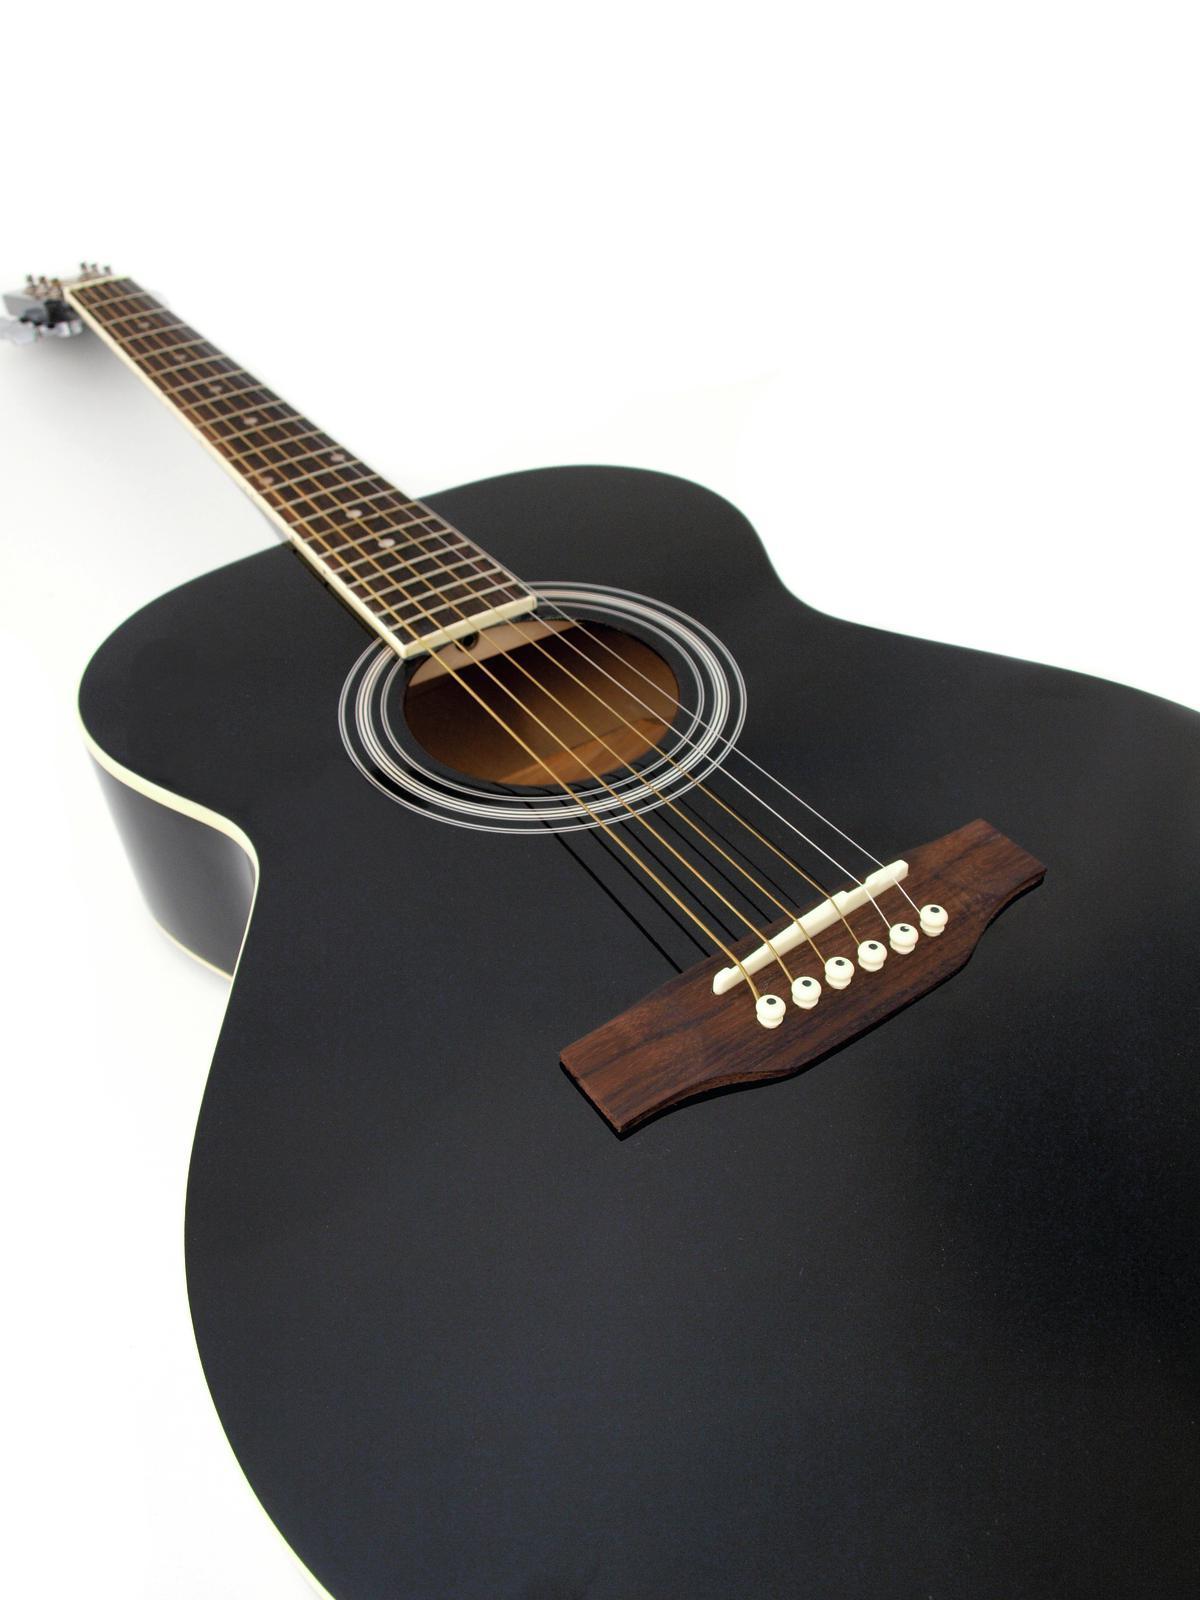 DIMAVERY AW-Occidentale 303 chitarra nera